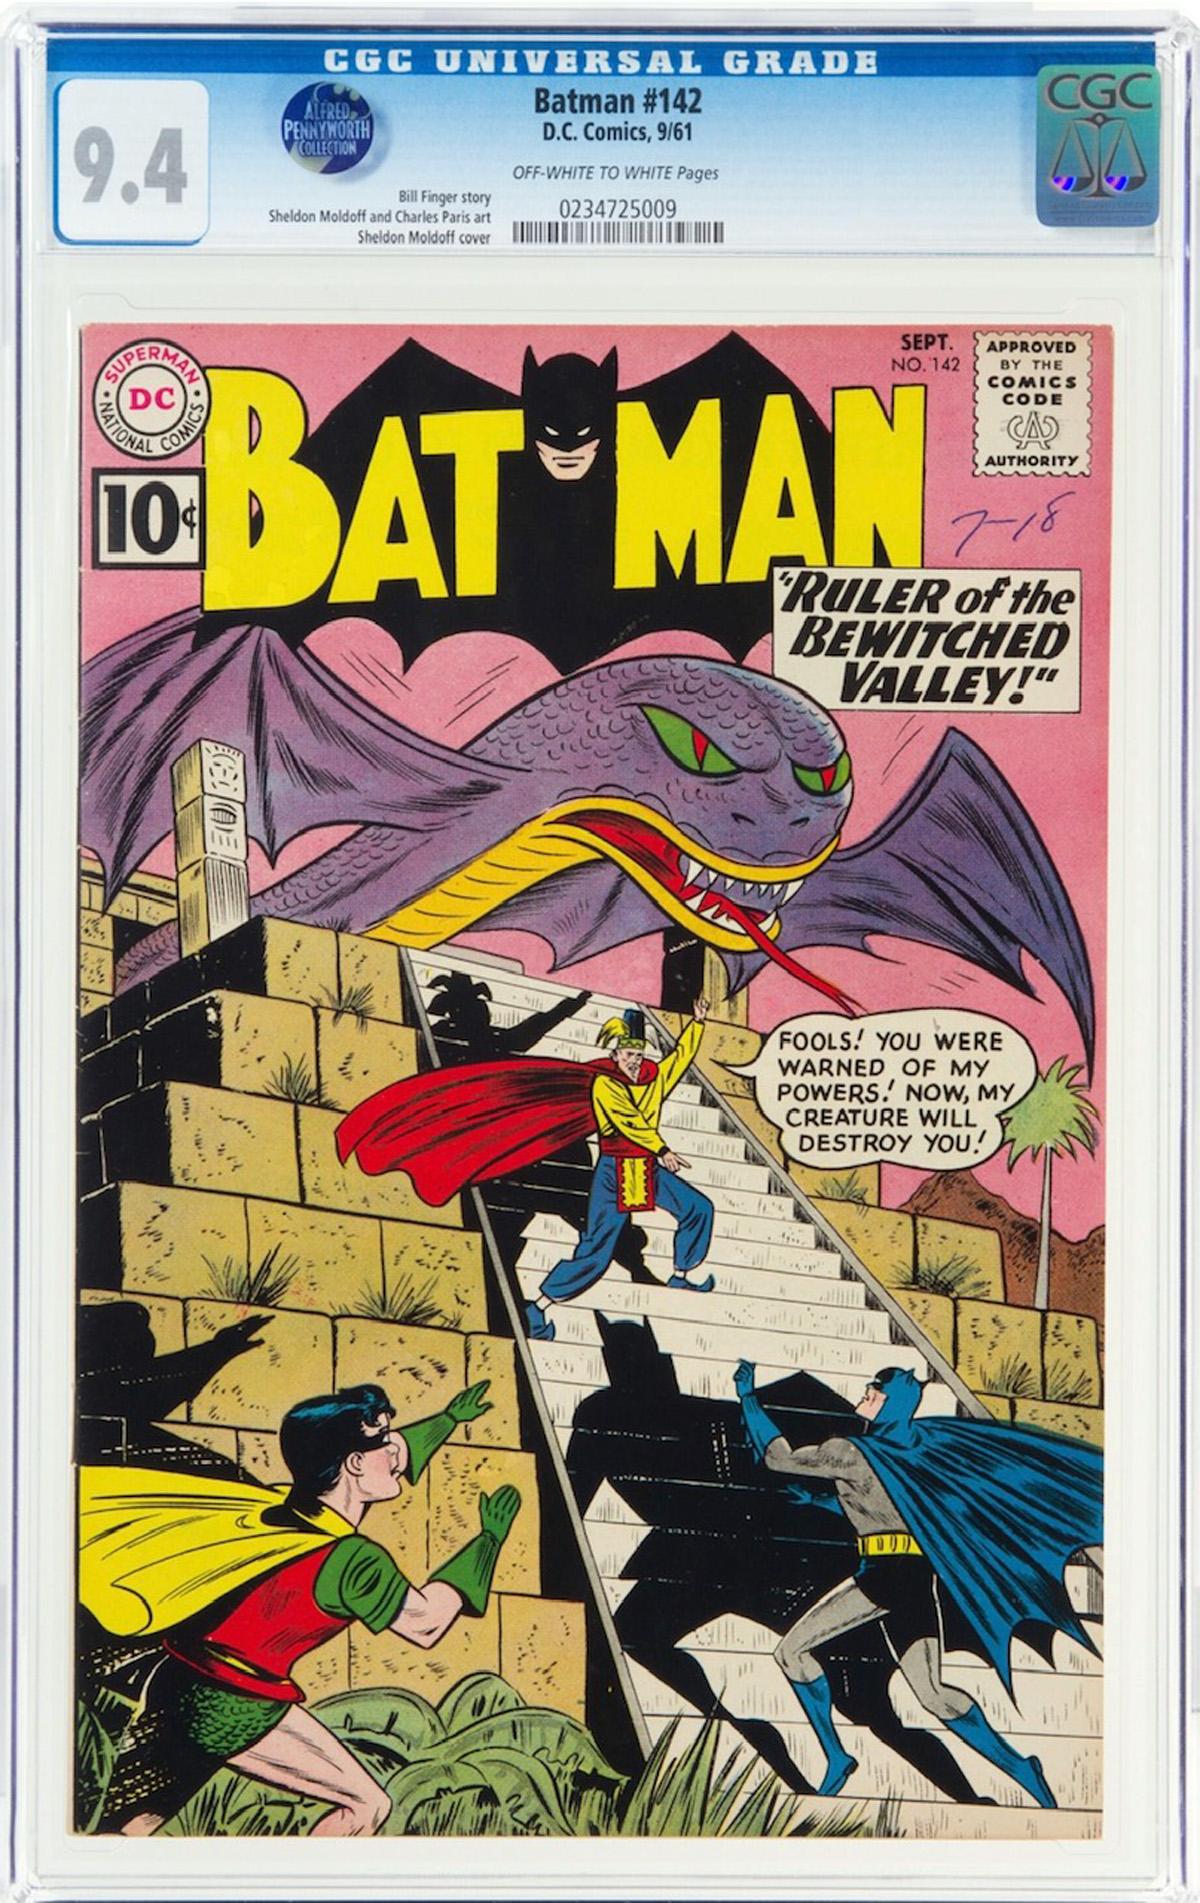 Batman #142 CGC 9.4 ow/w Alfred Pennyworth Collection